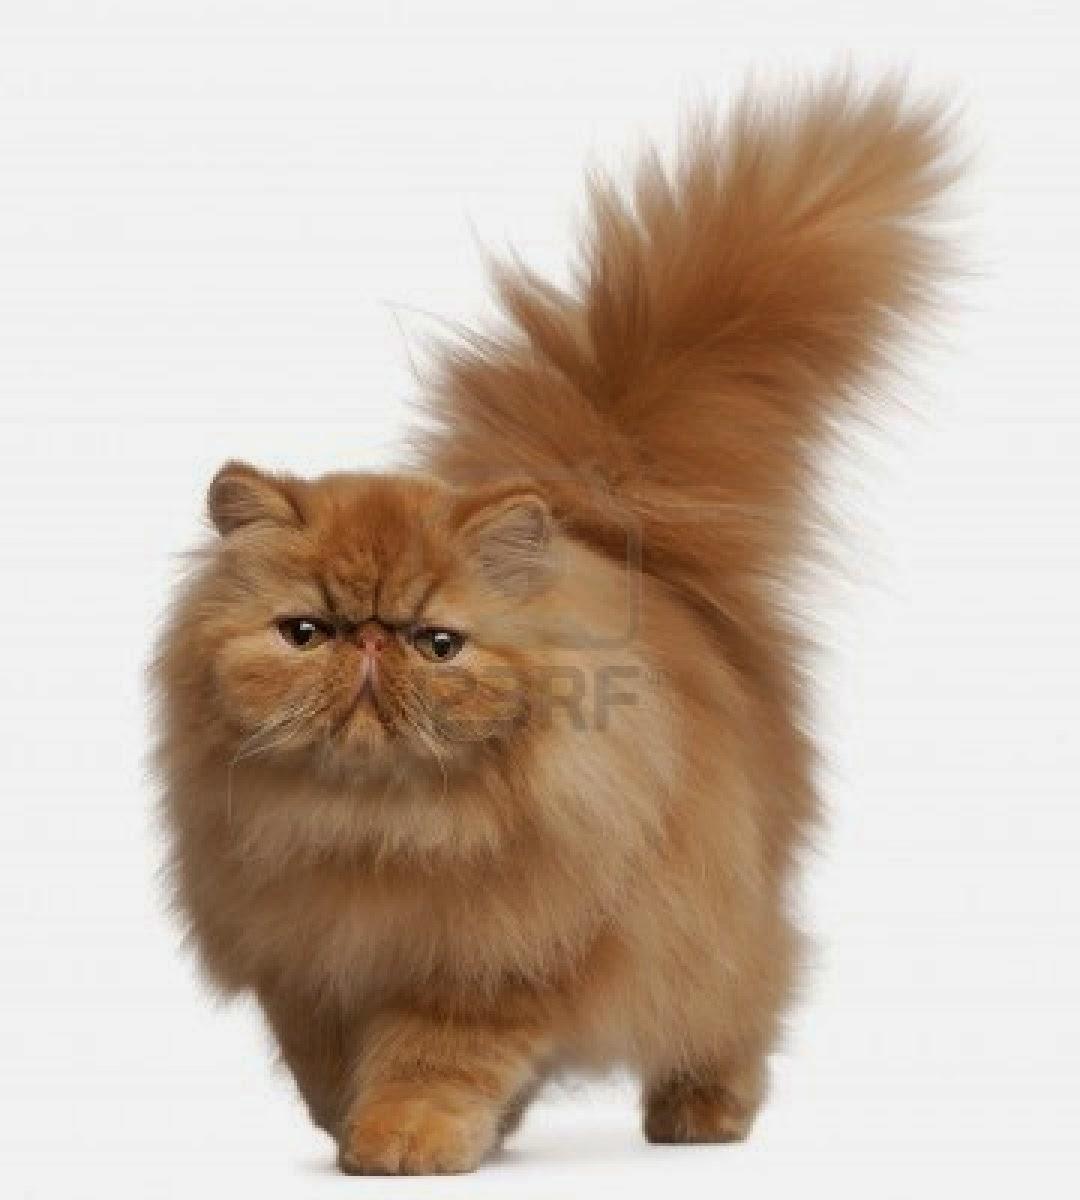 Senyum Comel 11 Gambar Kucing Parsi Yang Gebu